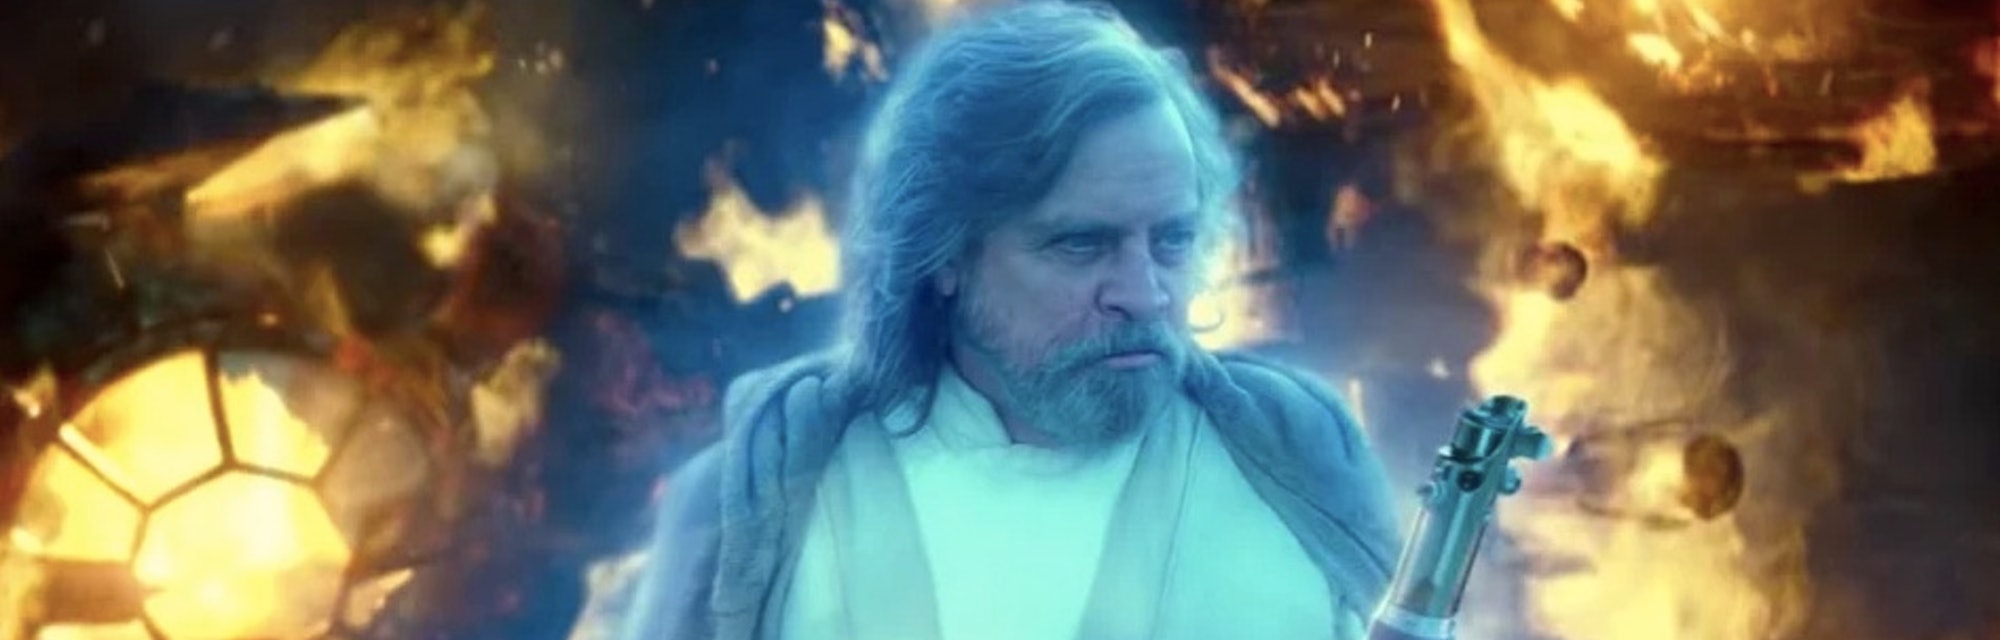 Rise Of Skywalker Dvd Digital Release Will Disappoint Fans In 1 Major Way